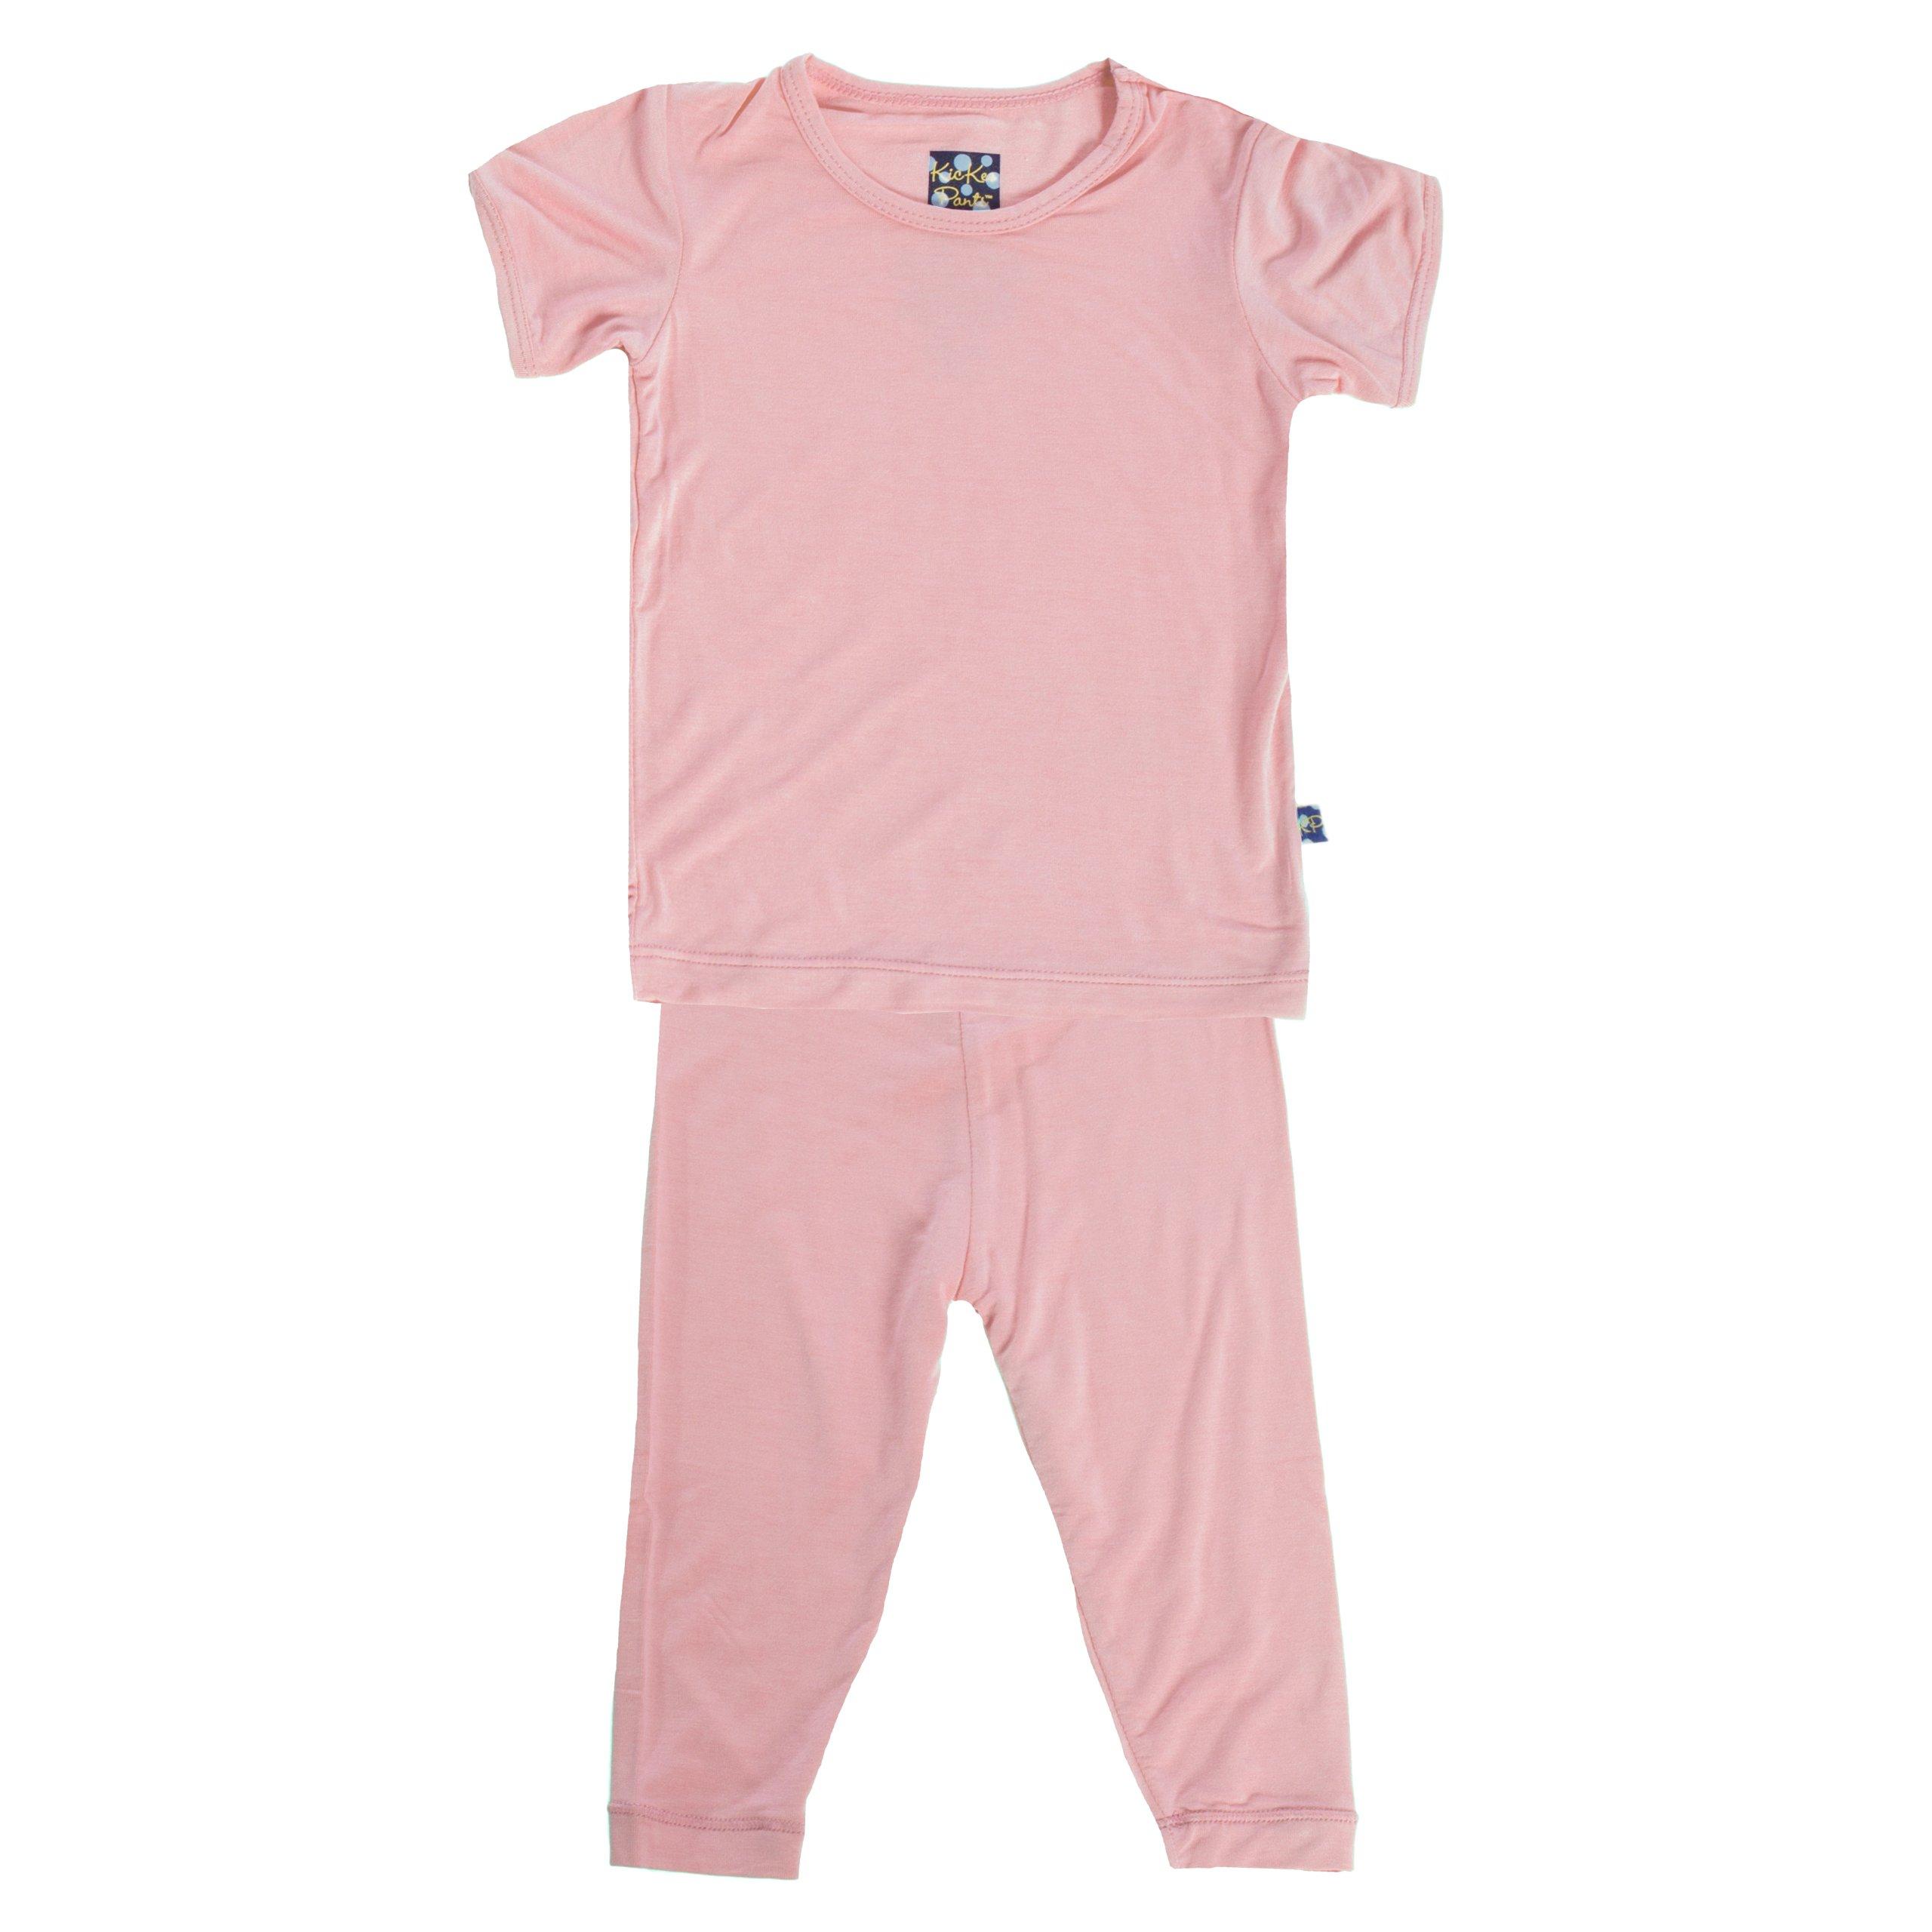 KicKee Pants Short Sleeve Pajama Set, Lotus, Girls 6 by Kickee Pants (Image #1)